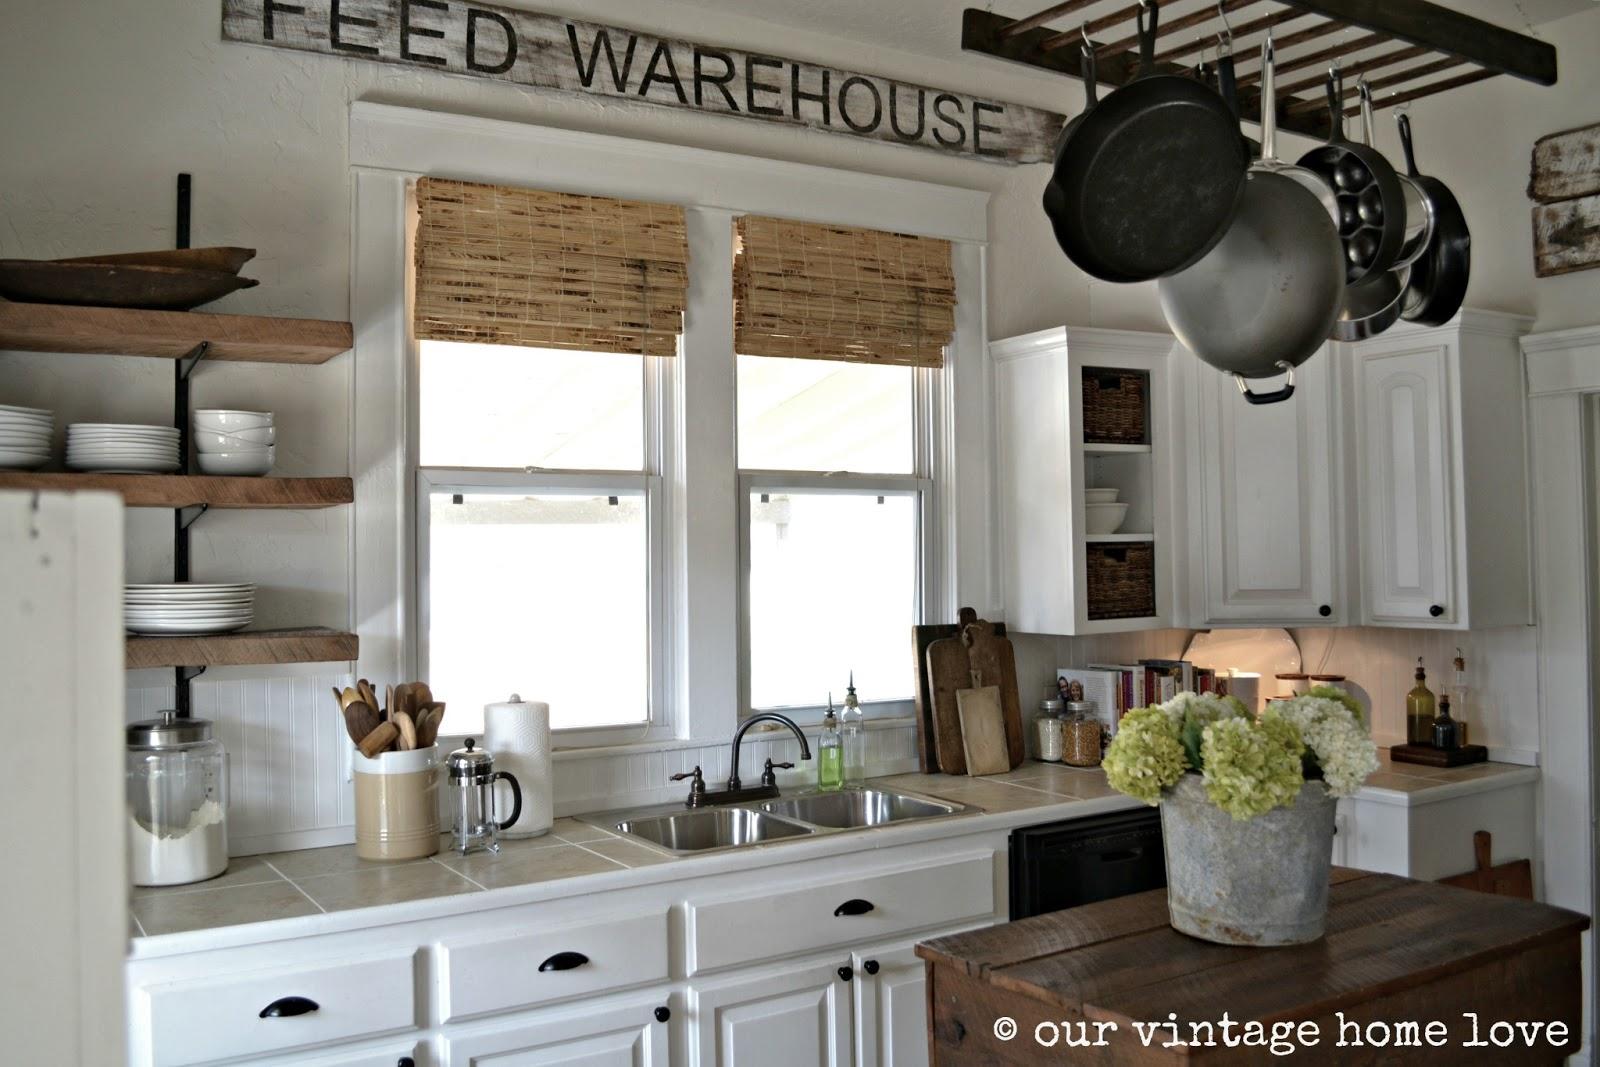 Our Vintage Home Love Blog